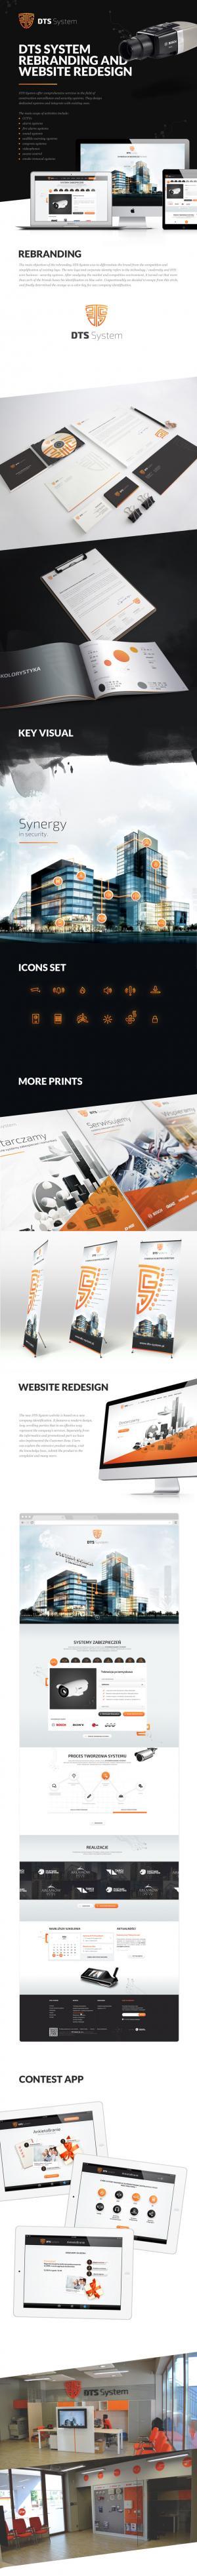 Rebranding dla DTS System - Lublin